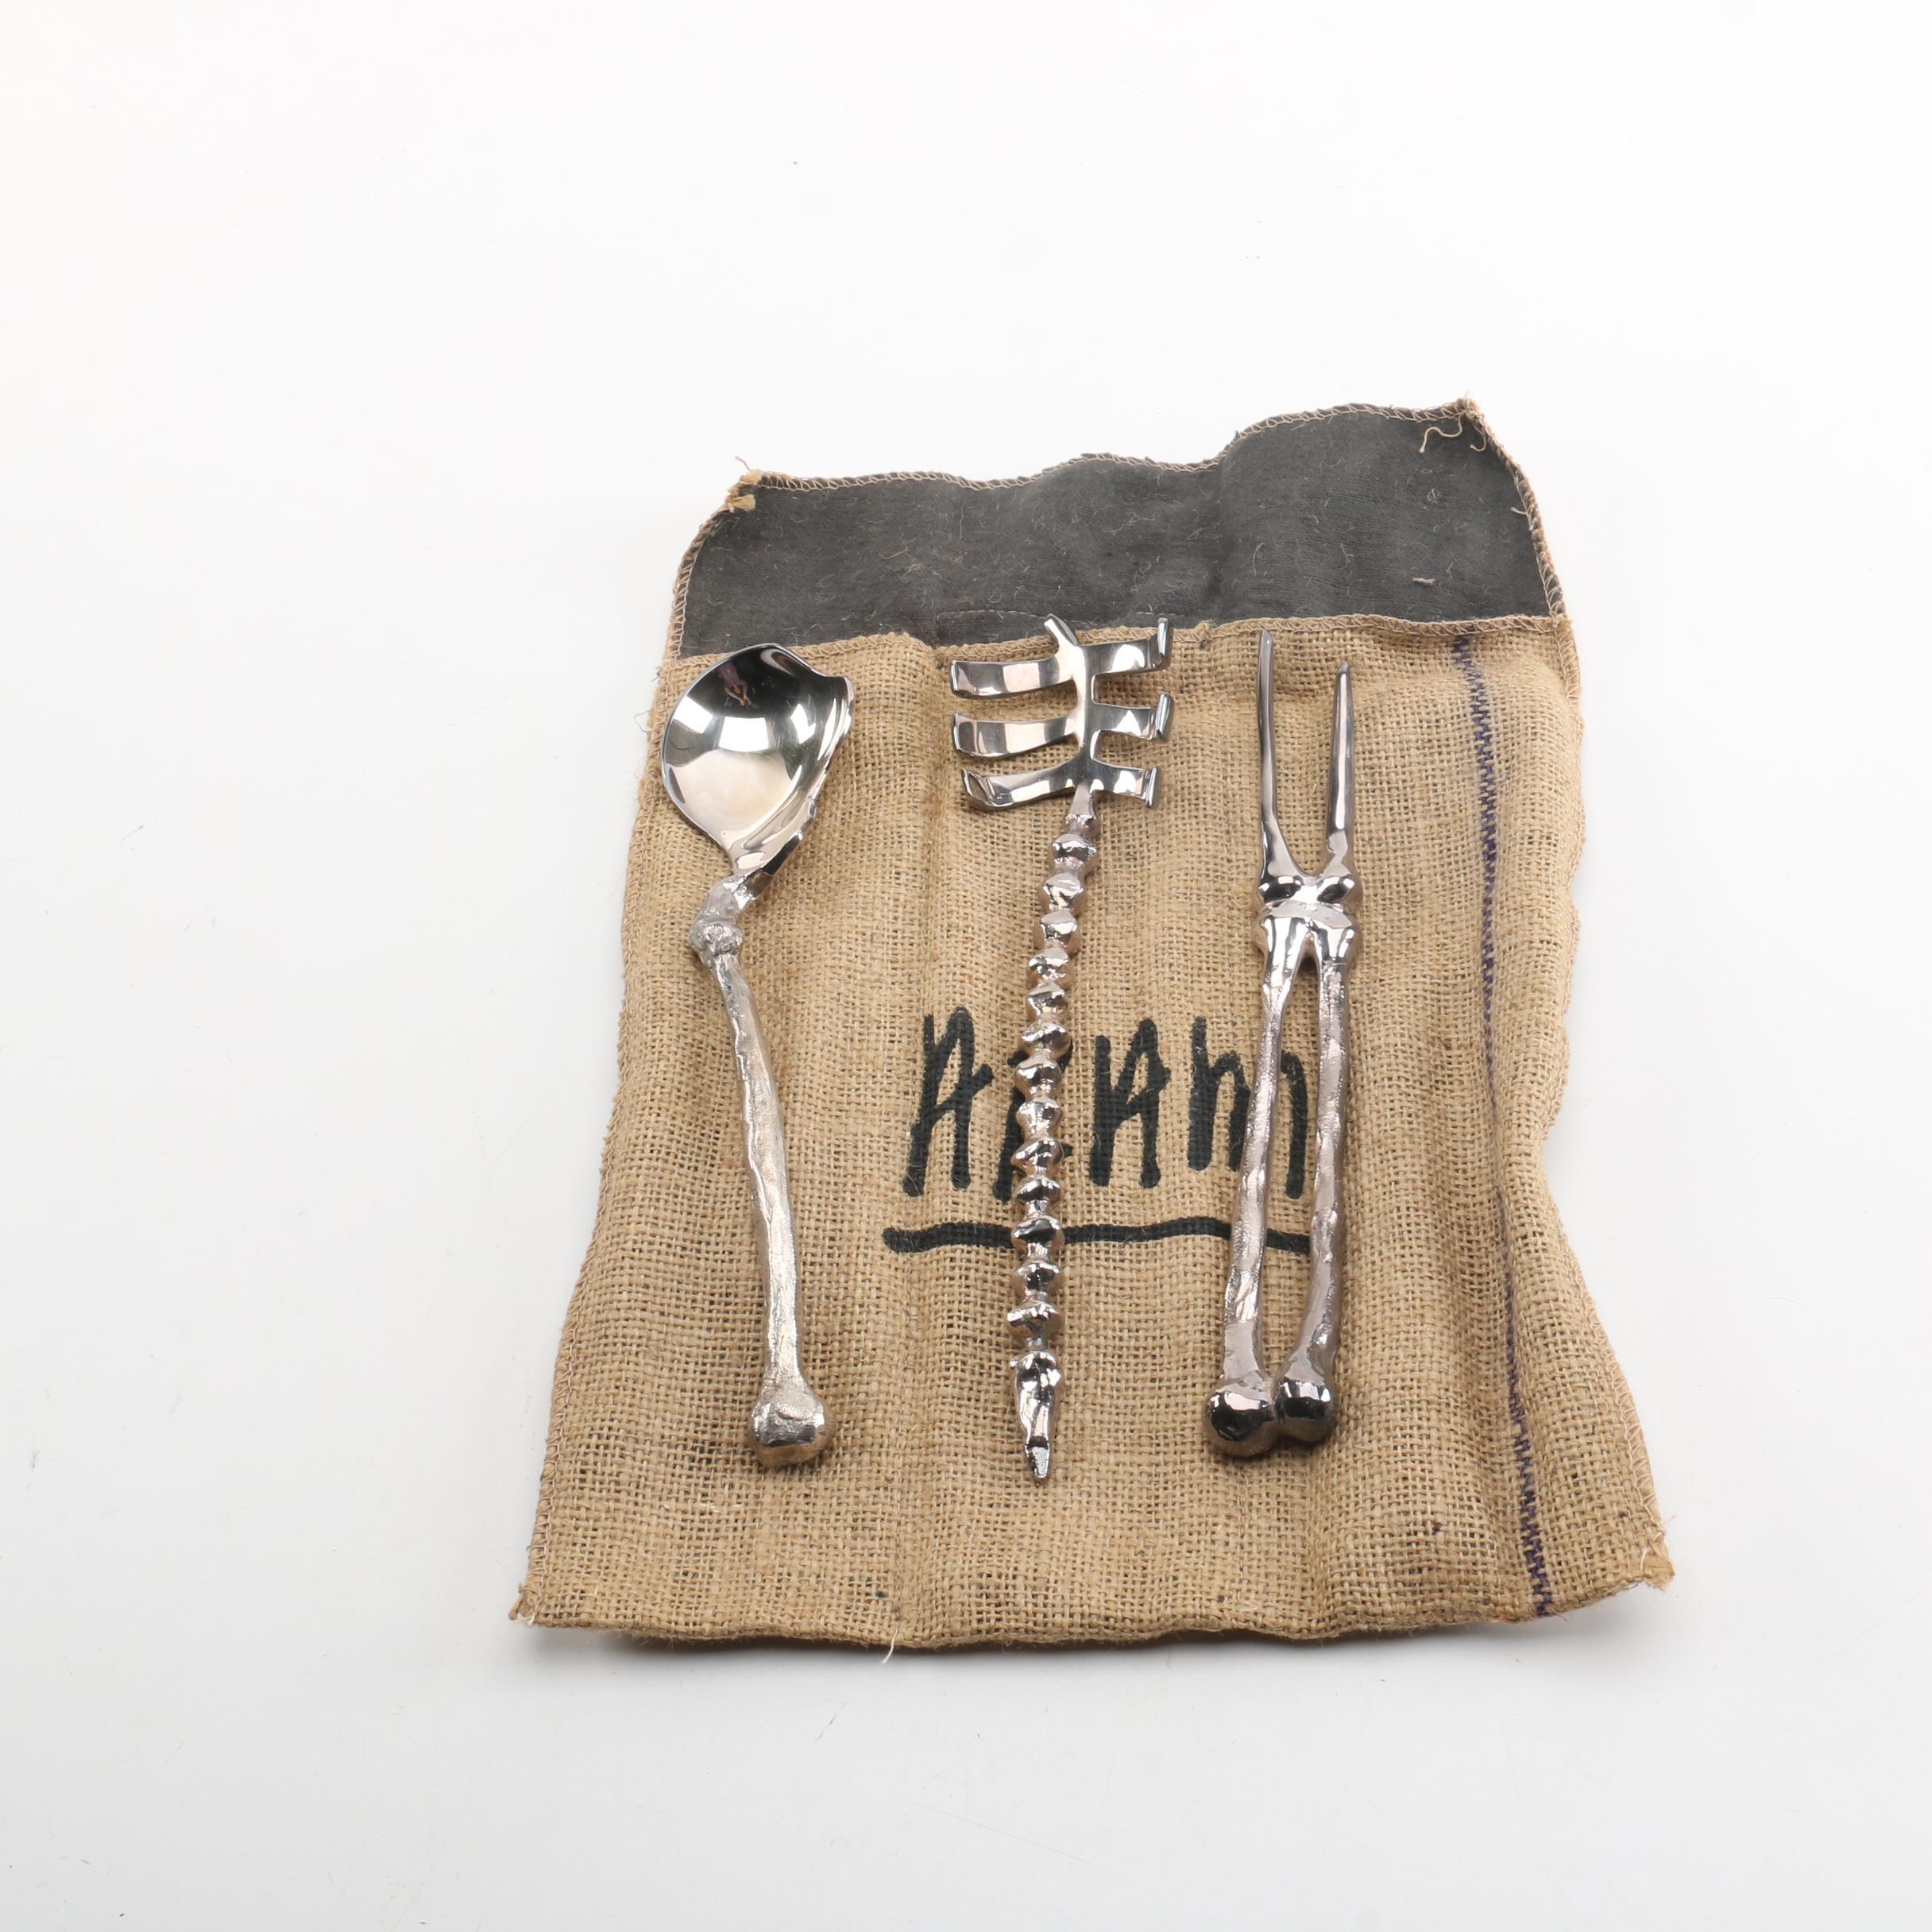 "Michael Aram ""Bone"" Silver Plate Skeletal System Serving Utensils"